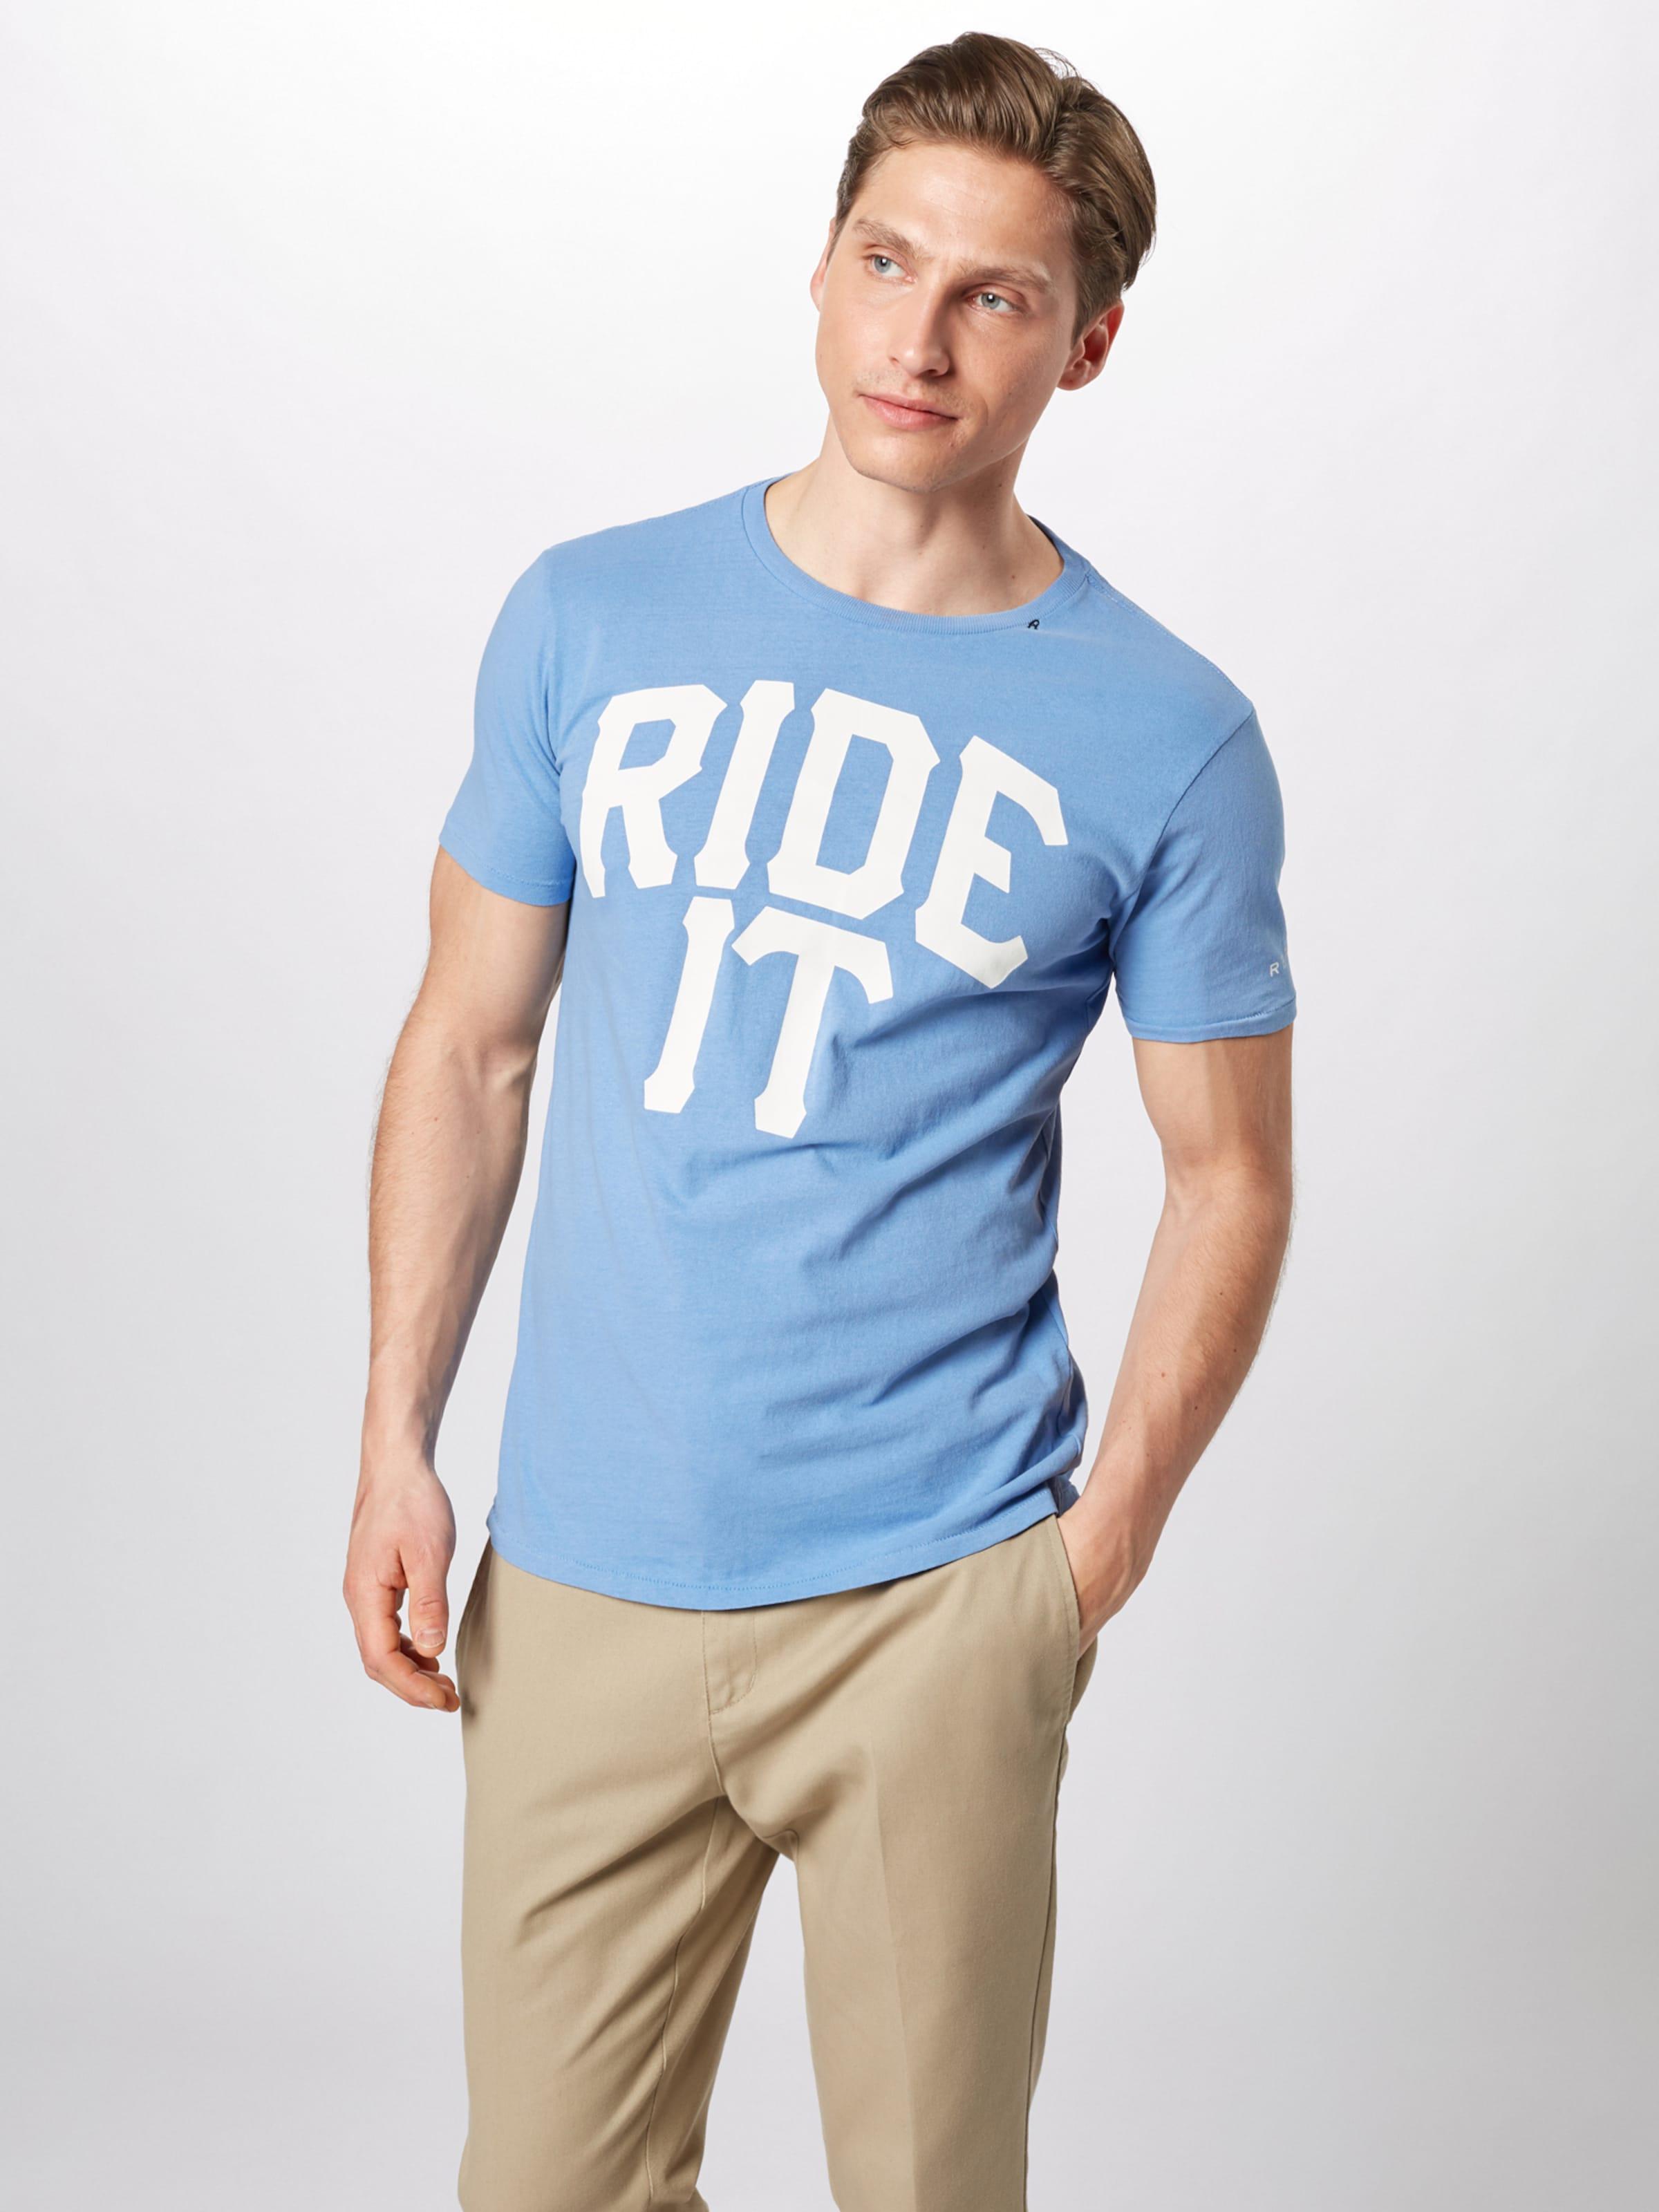 shirt shirt En CorailBlanc Replay T Replay CorailBlanc T En Replay pMVSUz